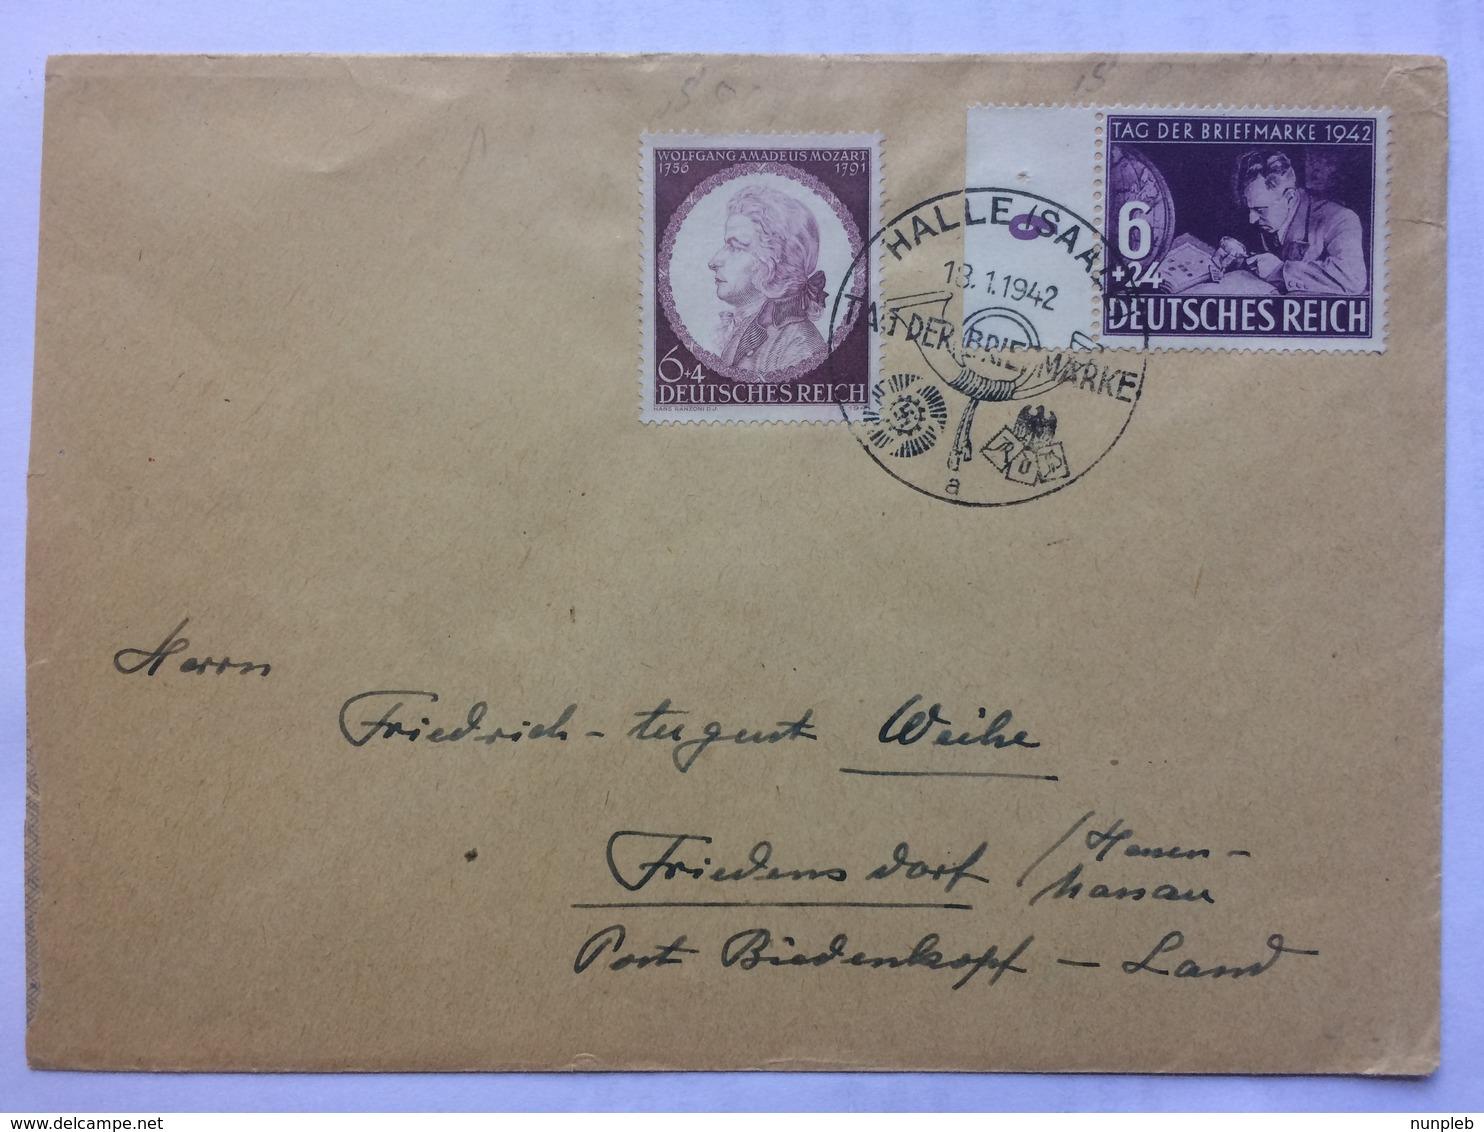 GERMANY 1942 Cover Halle Sonderstempel `Tag Der Briefmarke` To Friedensdorf - Briefe U. Dokumente